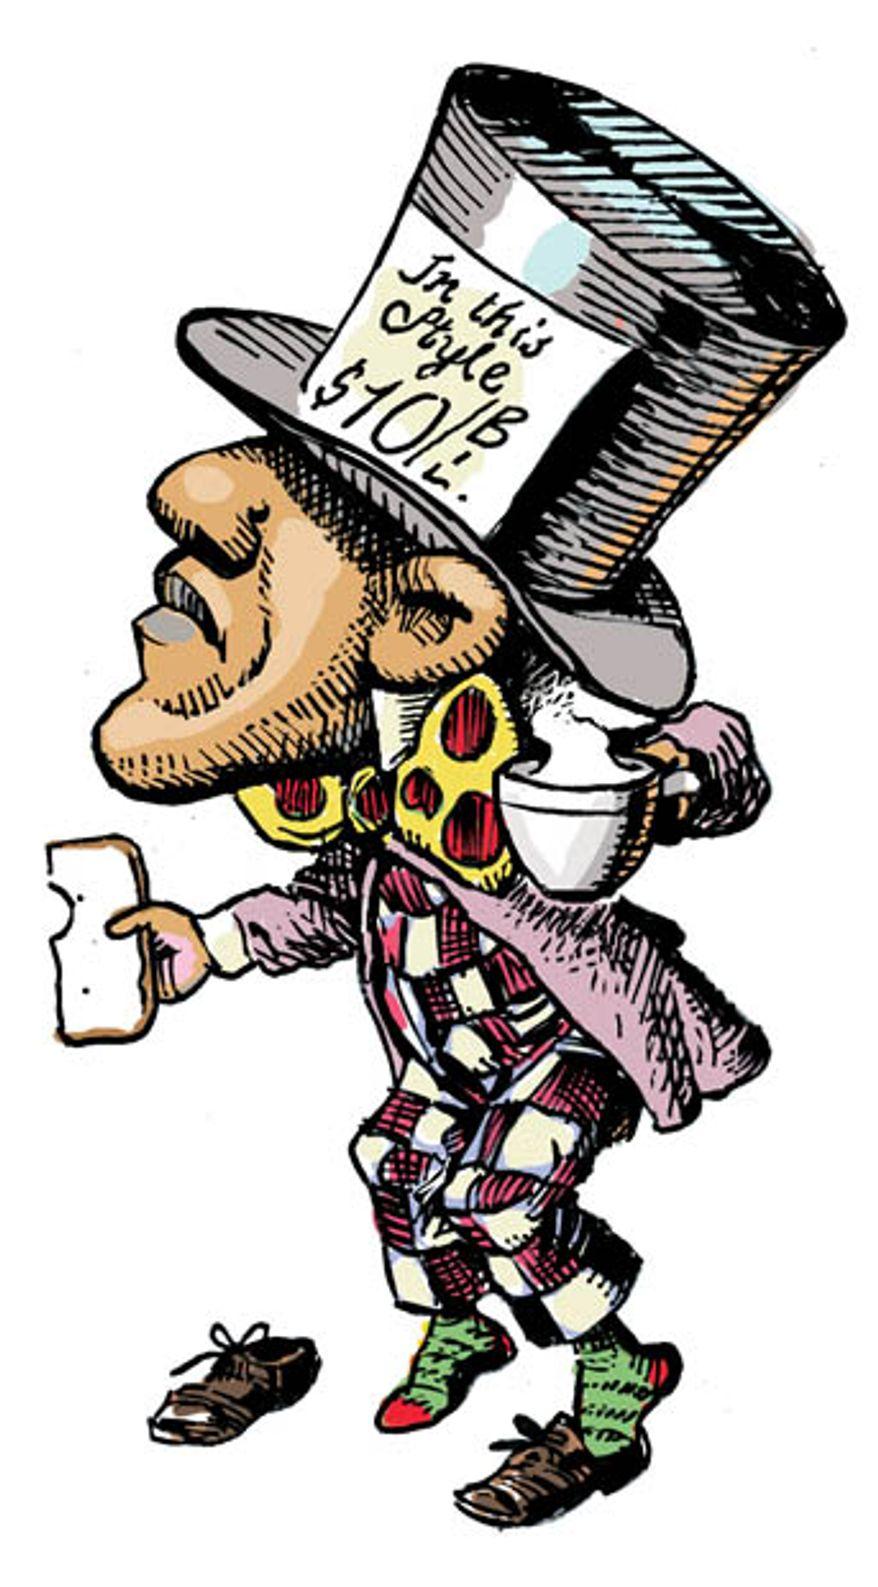 Illustration: Mad Hatter (after John Tenniel) by Alexander Hunter for The Washington Times